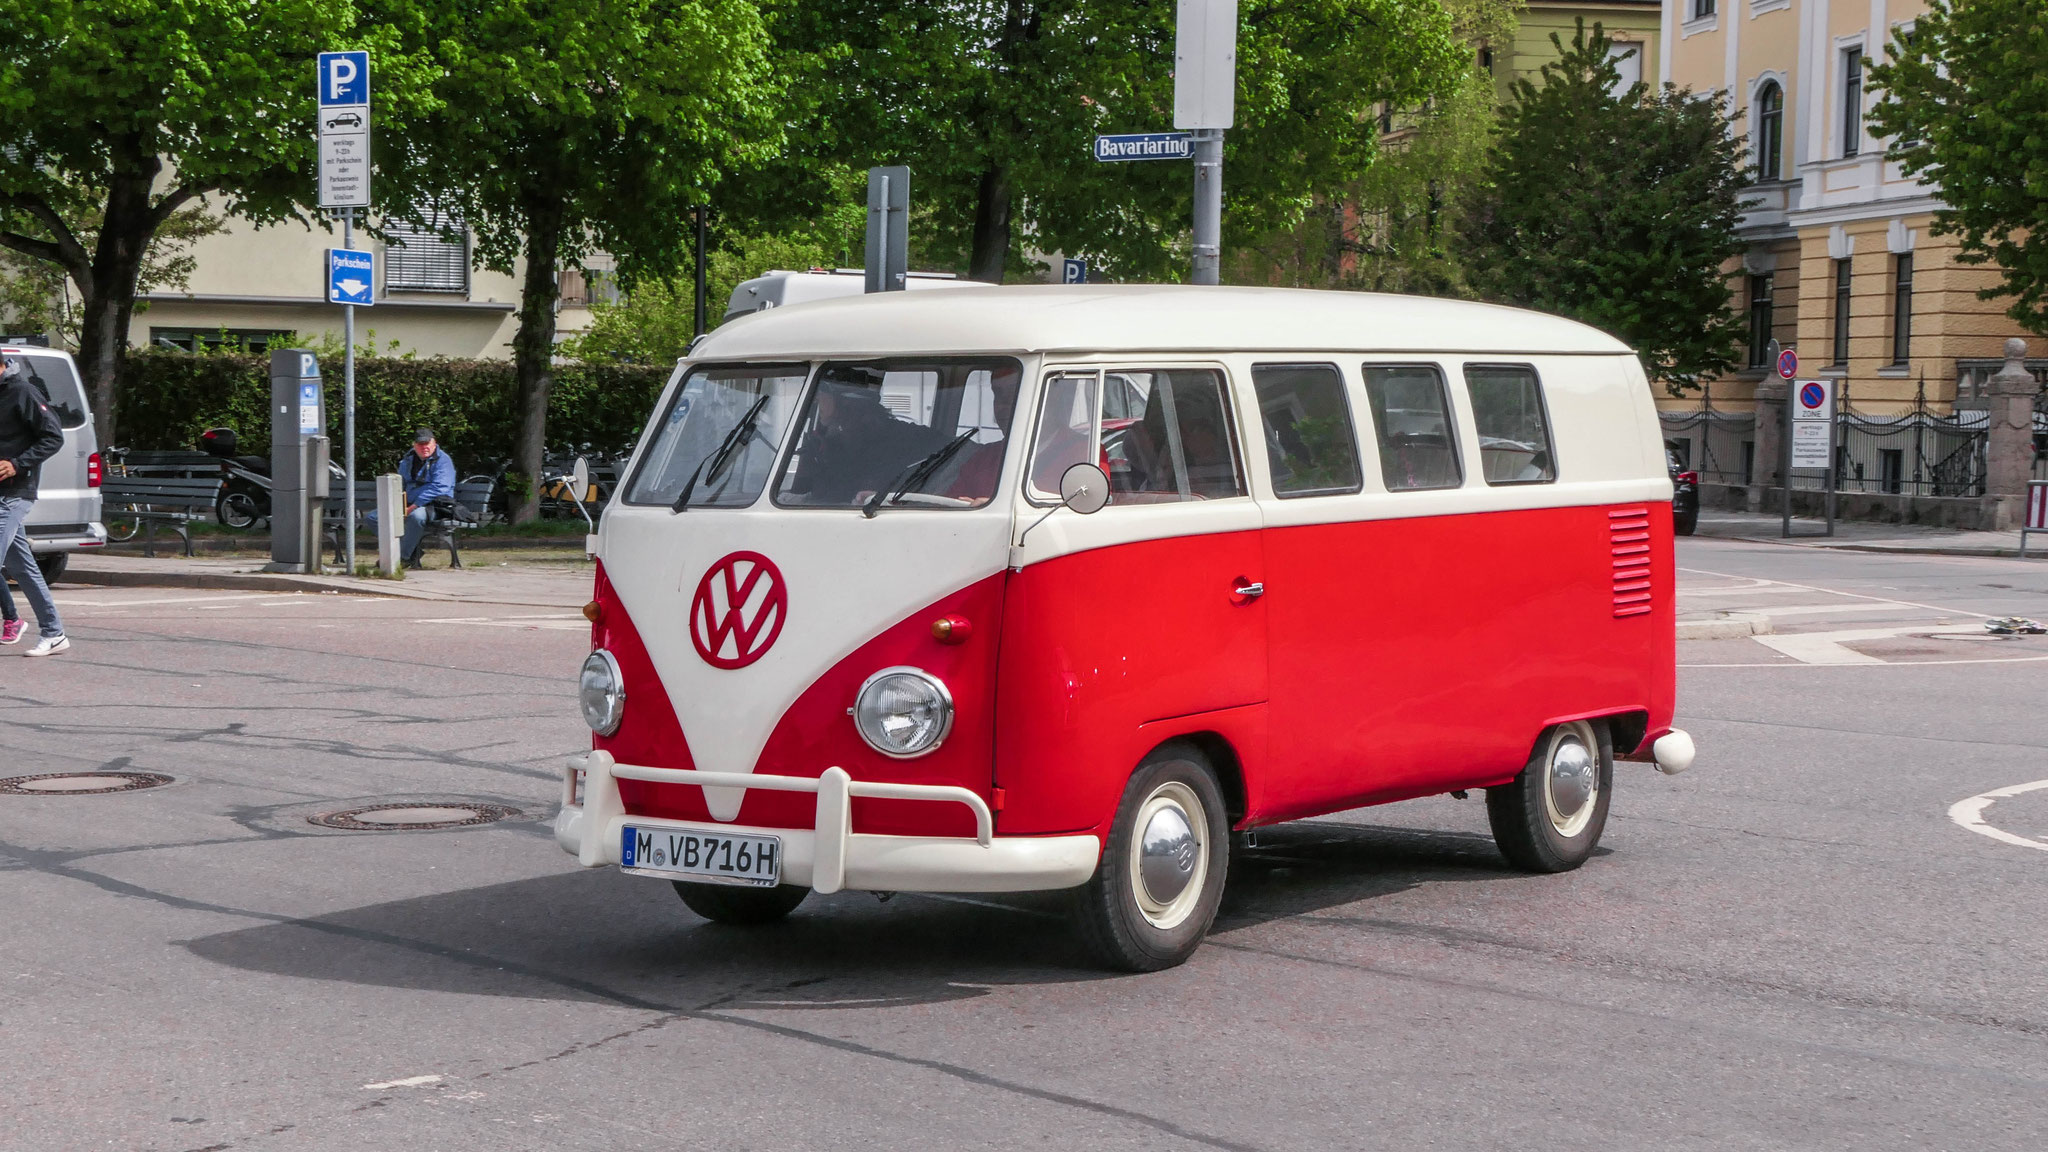 VW T1 - M-VB-716H